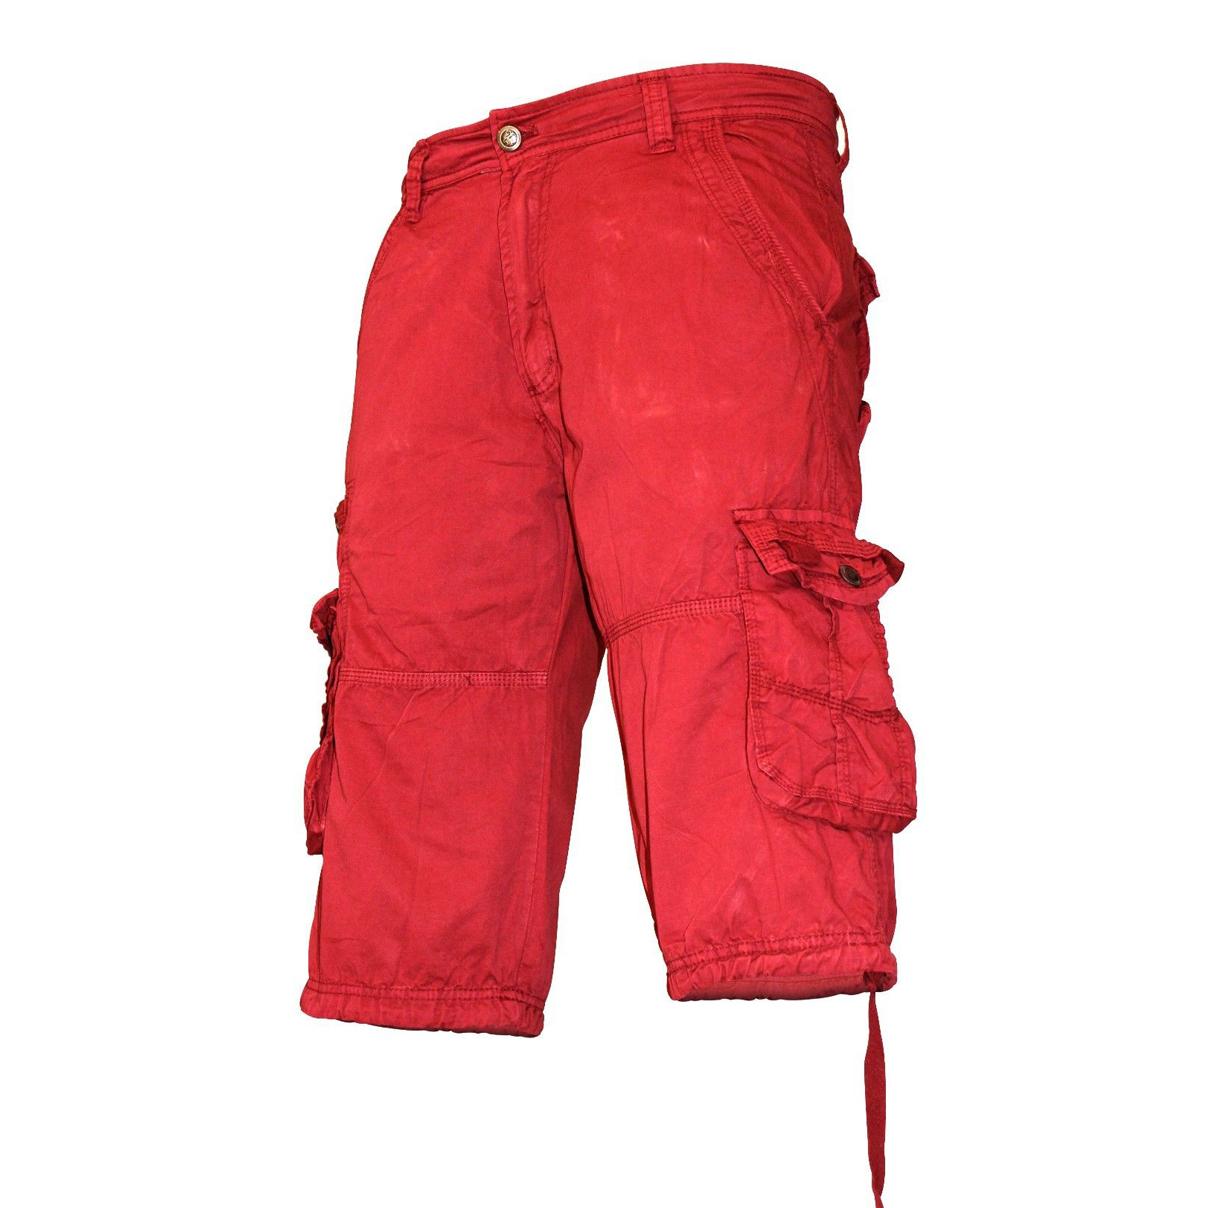 Skylinewears Mens Oringish Red Regular Cargo Shorts Trousers - Skylinewears